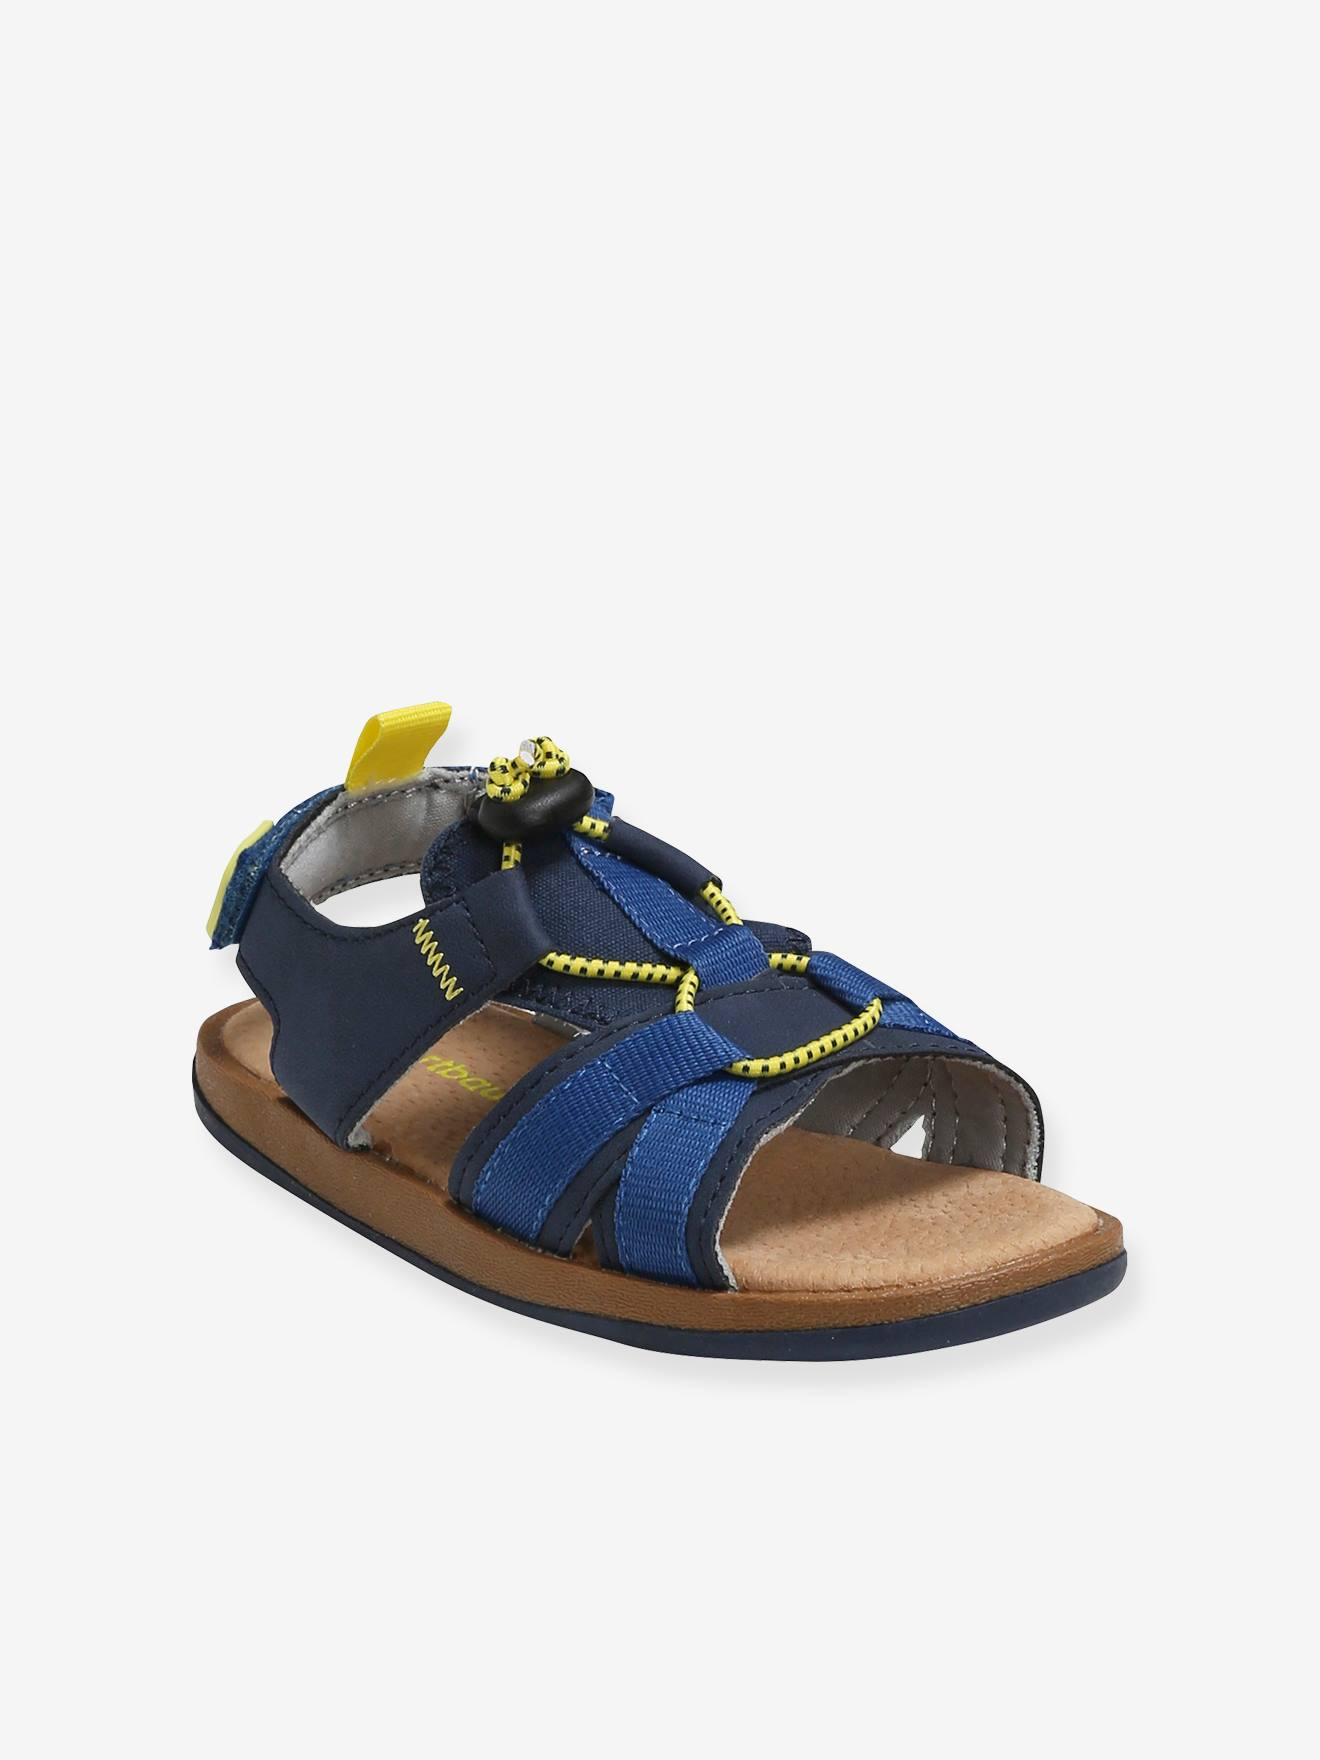 Sandales scratchées garçon bleu